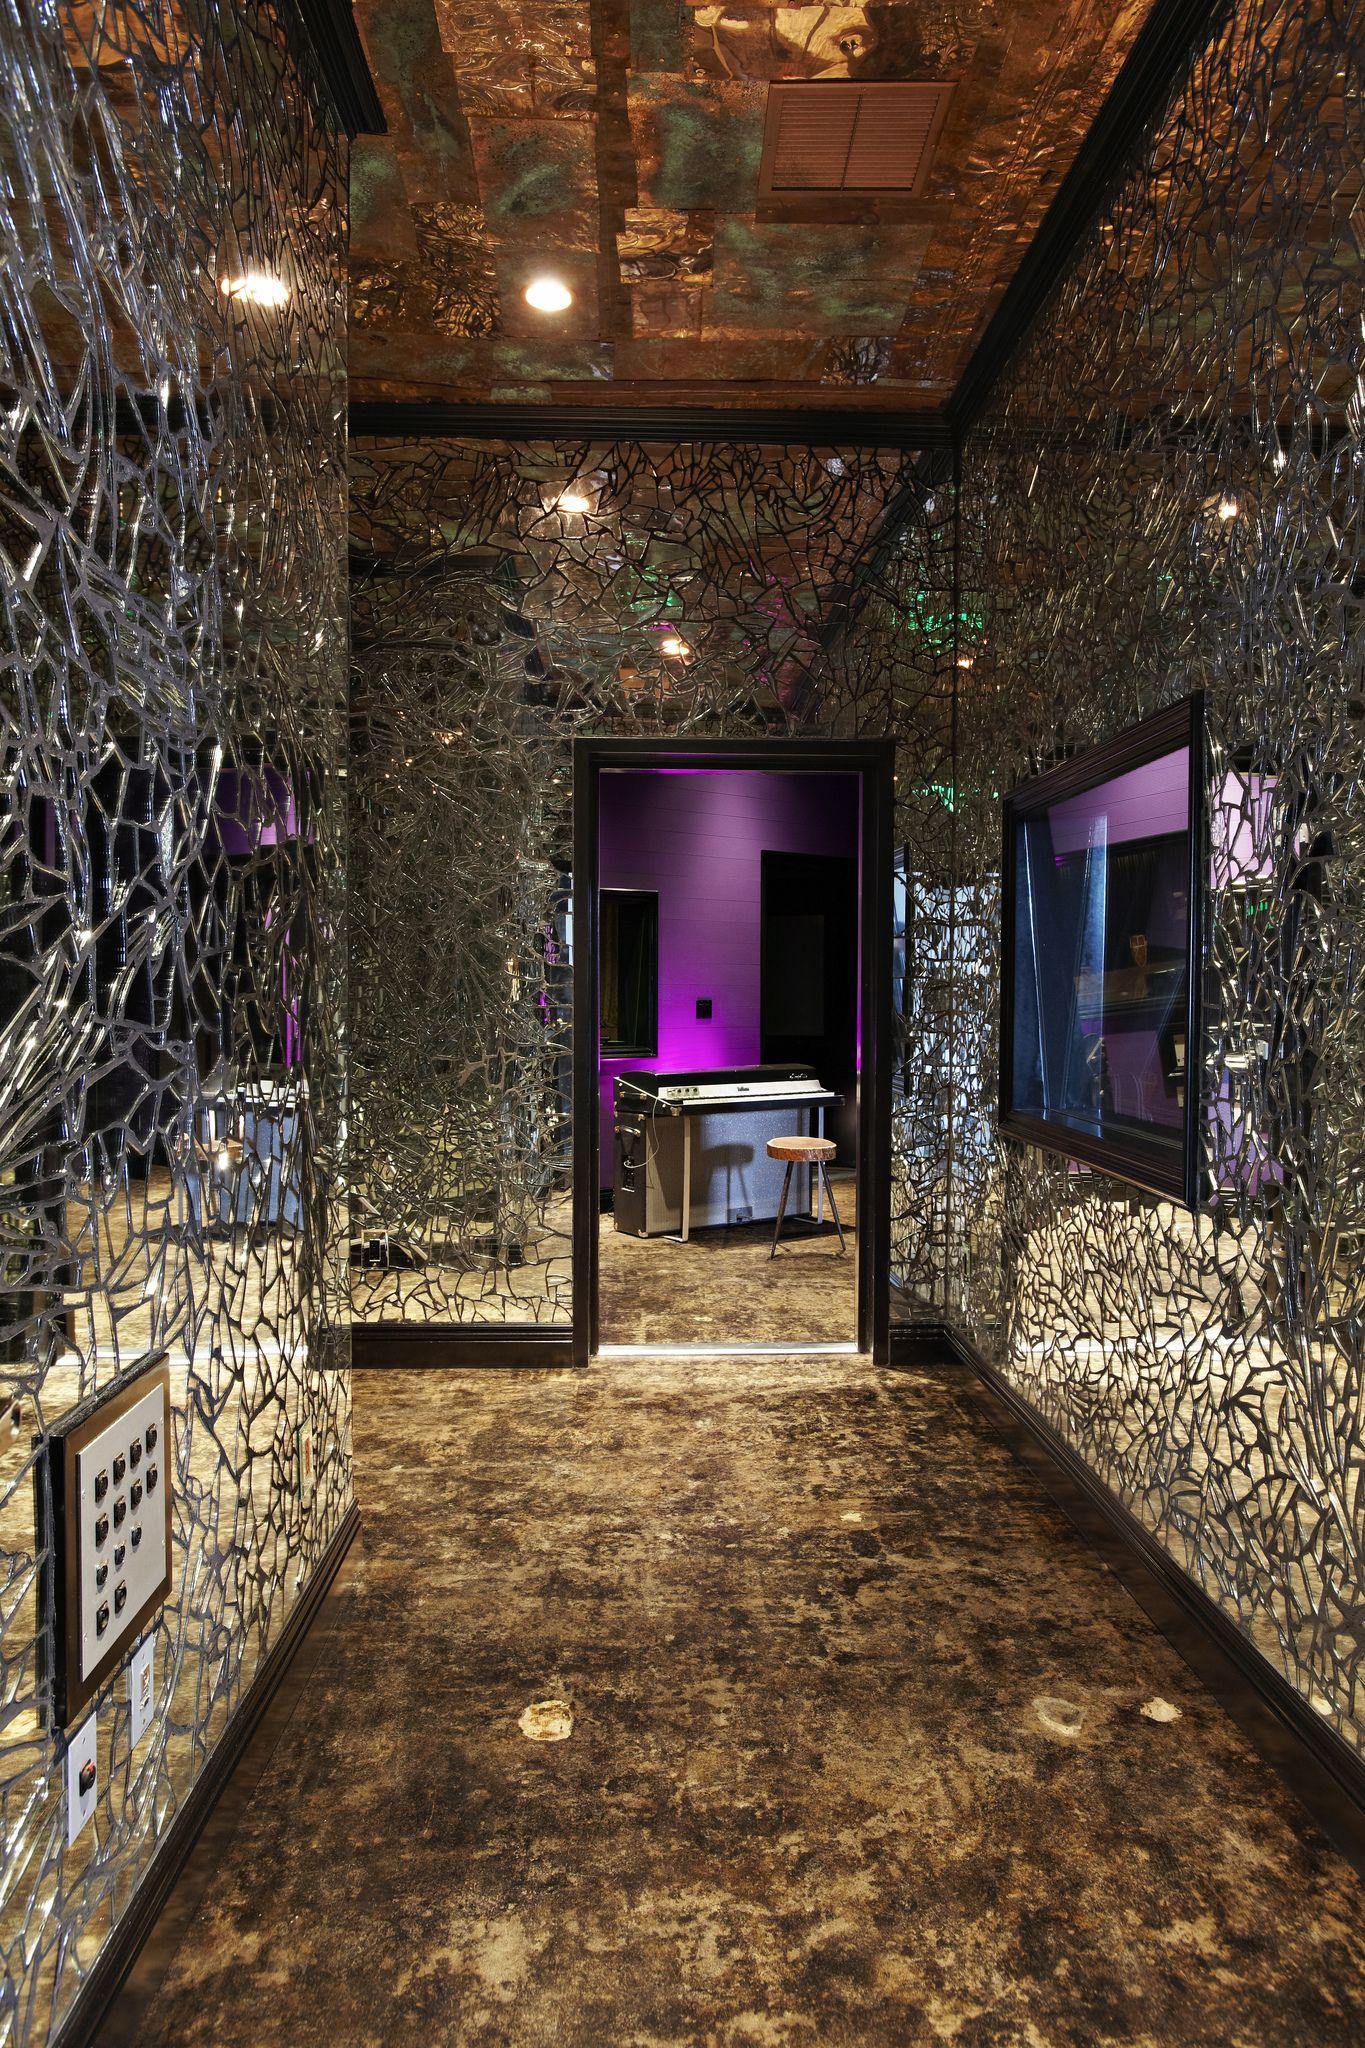 PLAYBACK RECORDING STUDIO ECHO CHAMBER Mirror wall art